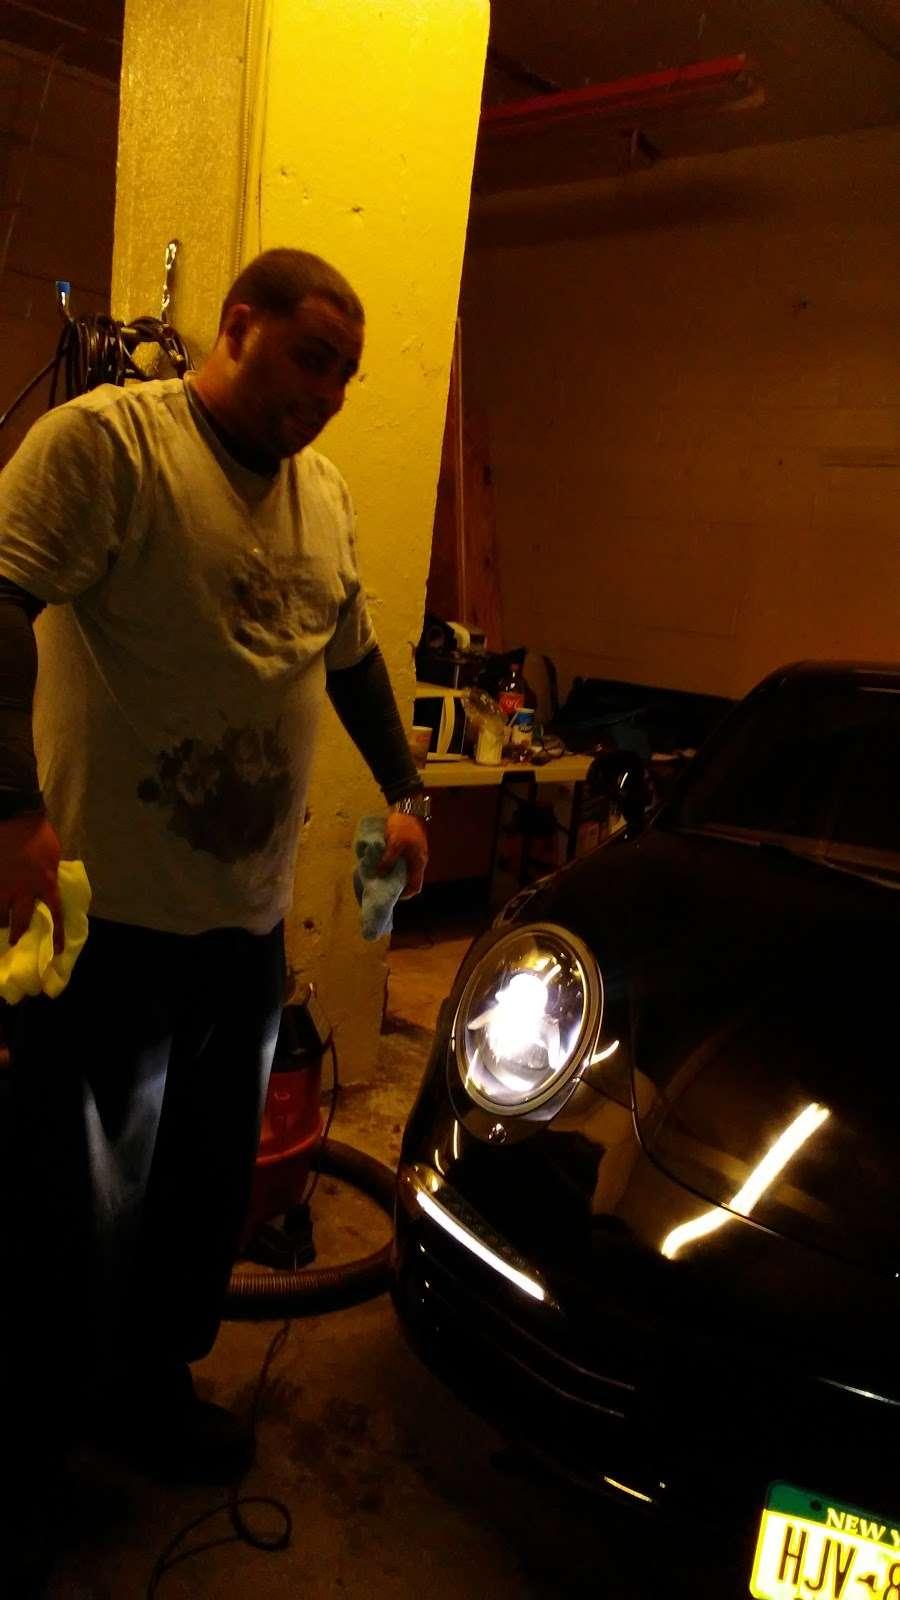 King Automobile Body - car repair  | Photo 1 of 2 | Address: 905 Sacket Ave, The Bronx, NY 10462, USA | Phone: (718) 684-2323